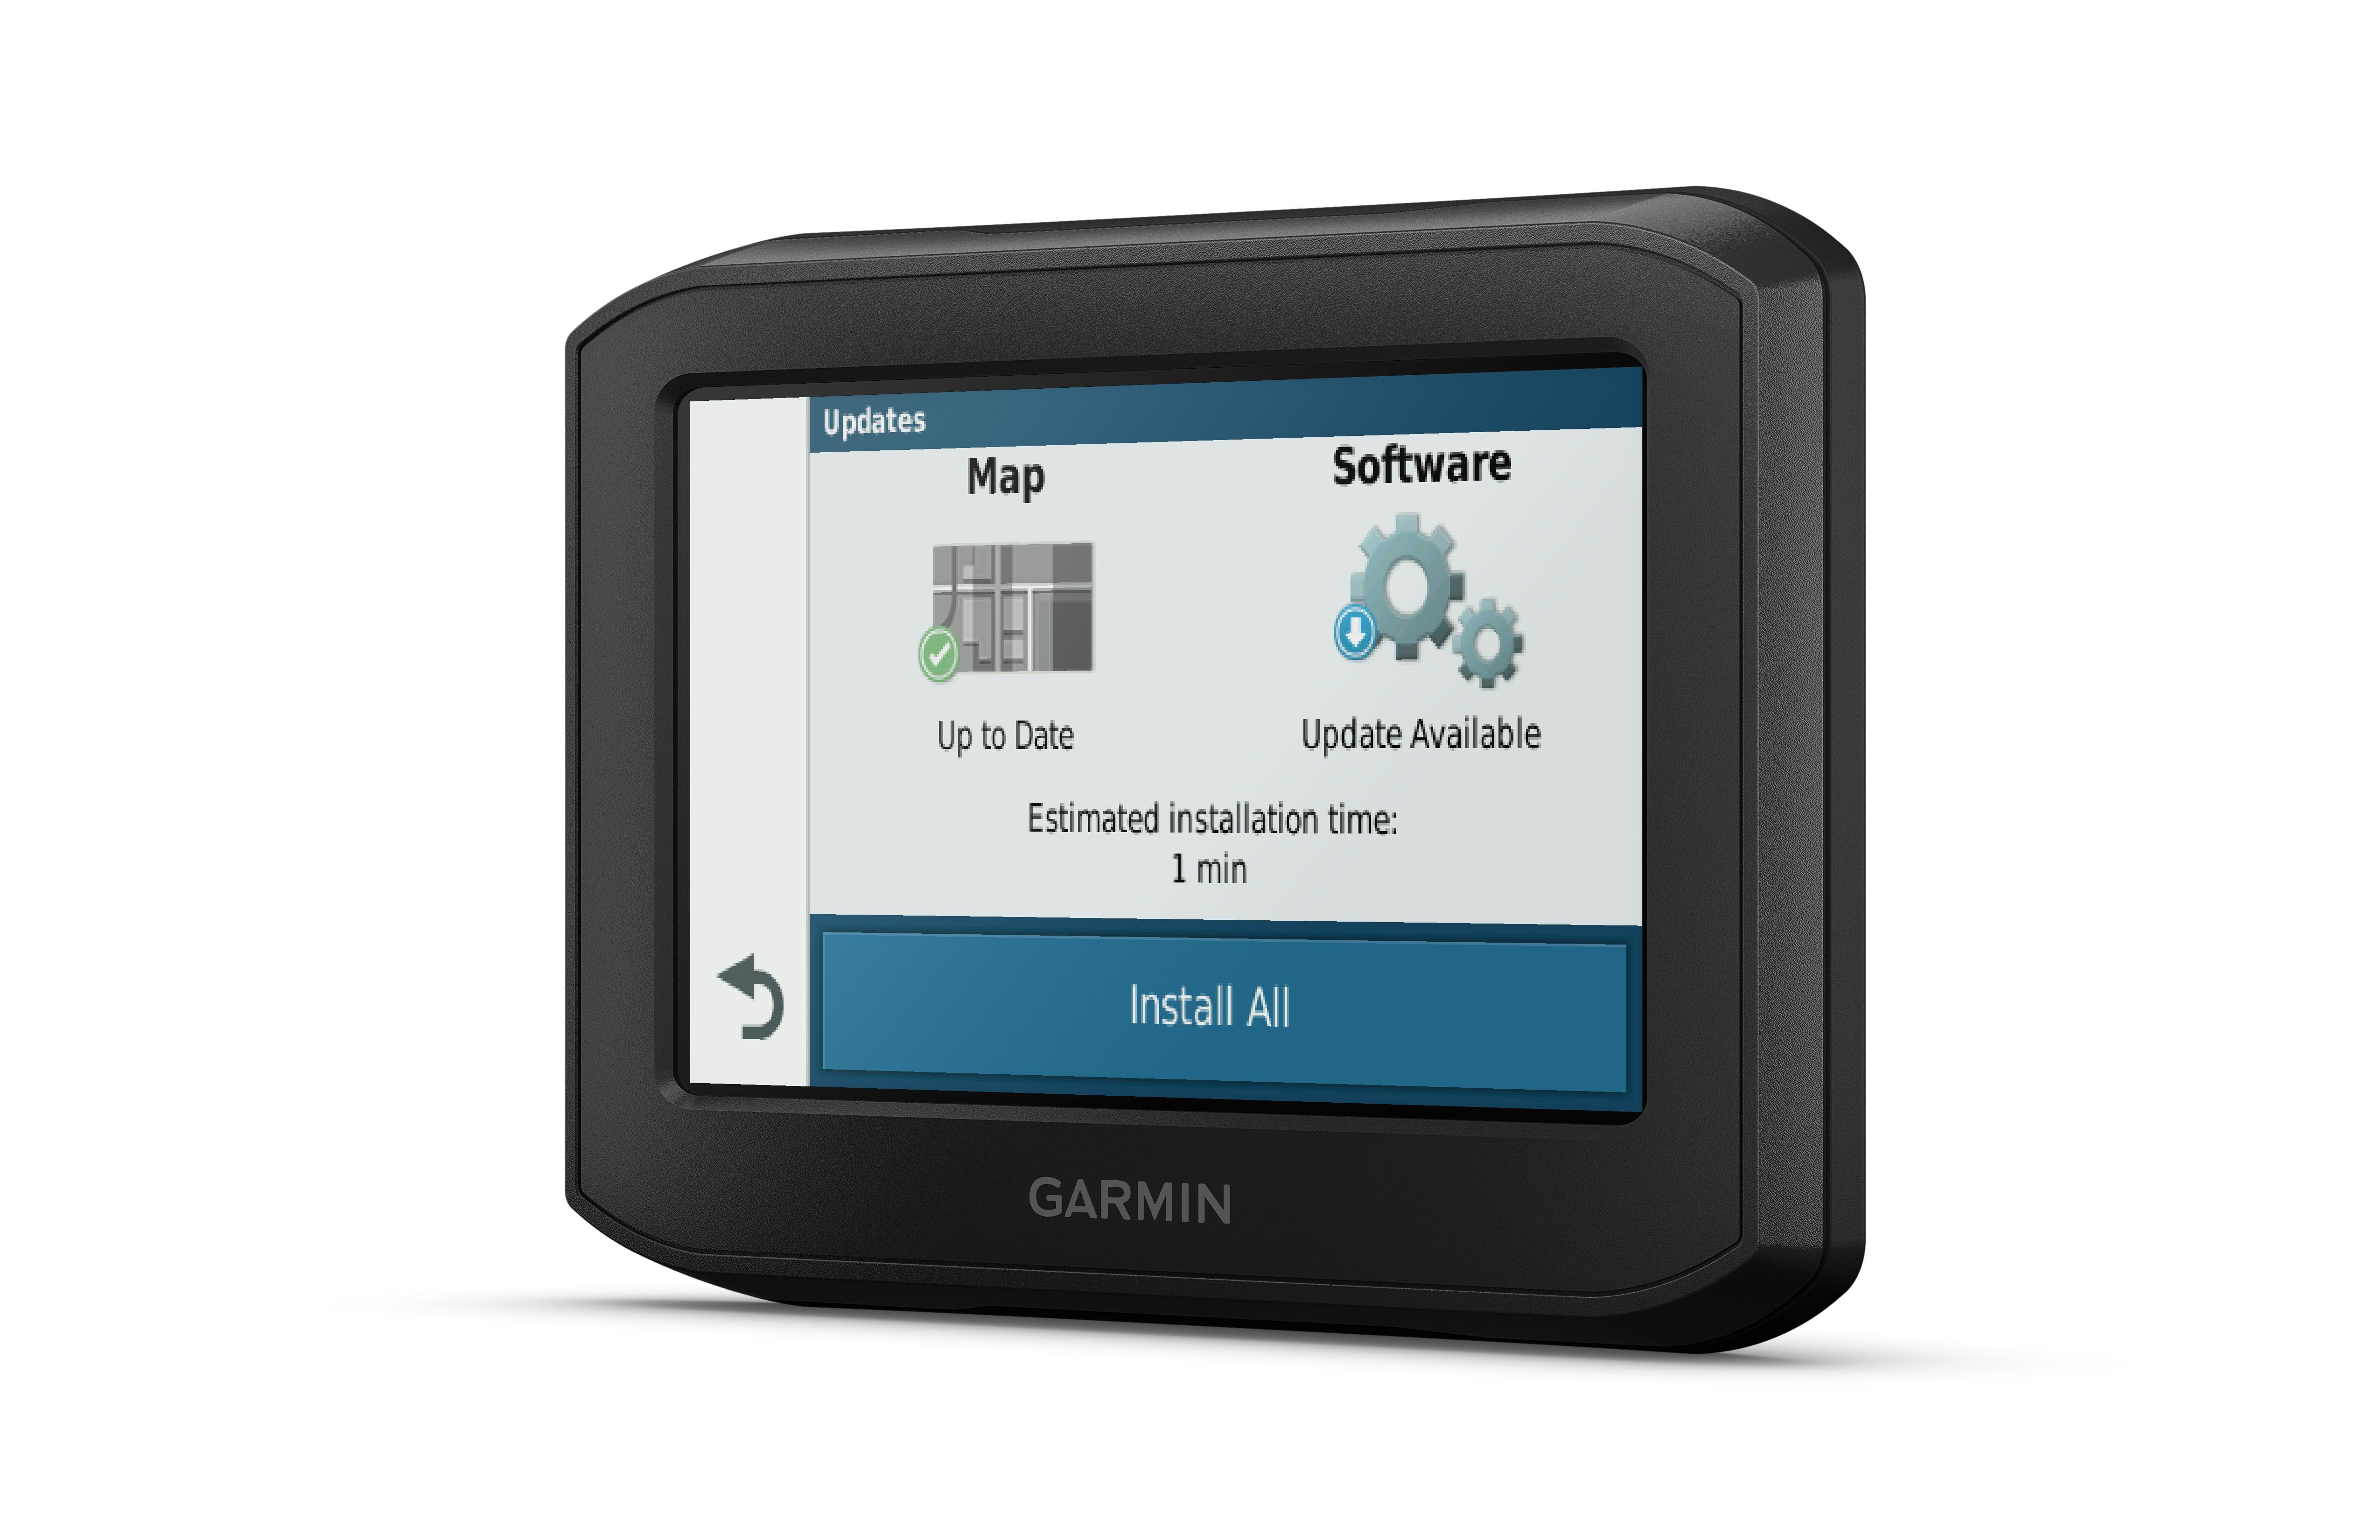 Garmin Zumo 396 LMT-S Europa mit 4,3 Zoll Display on